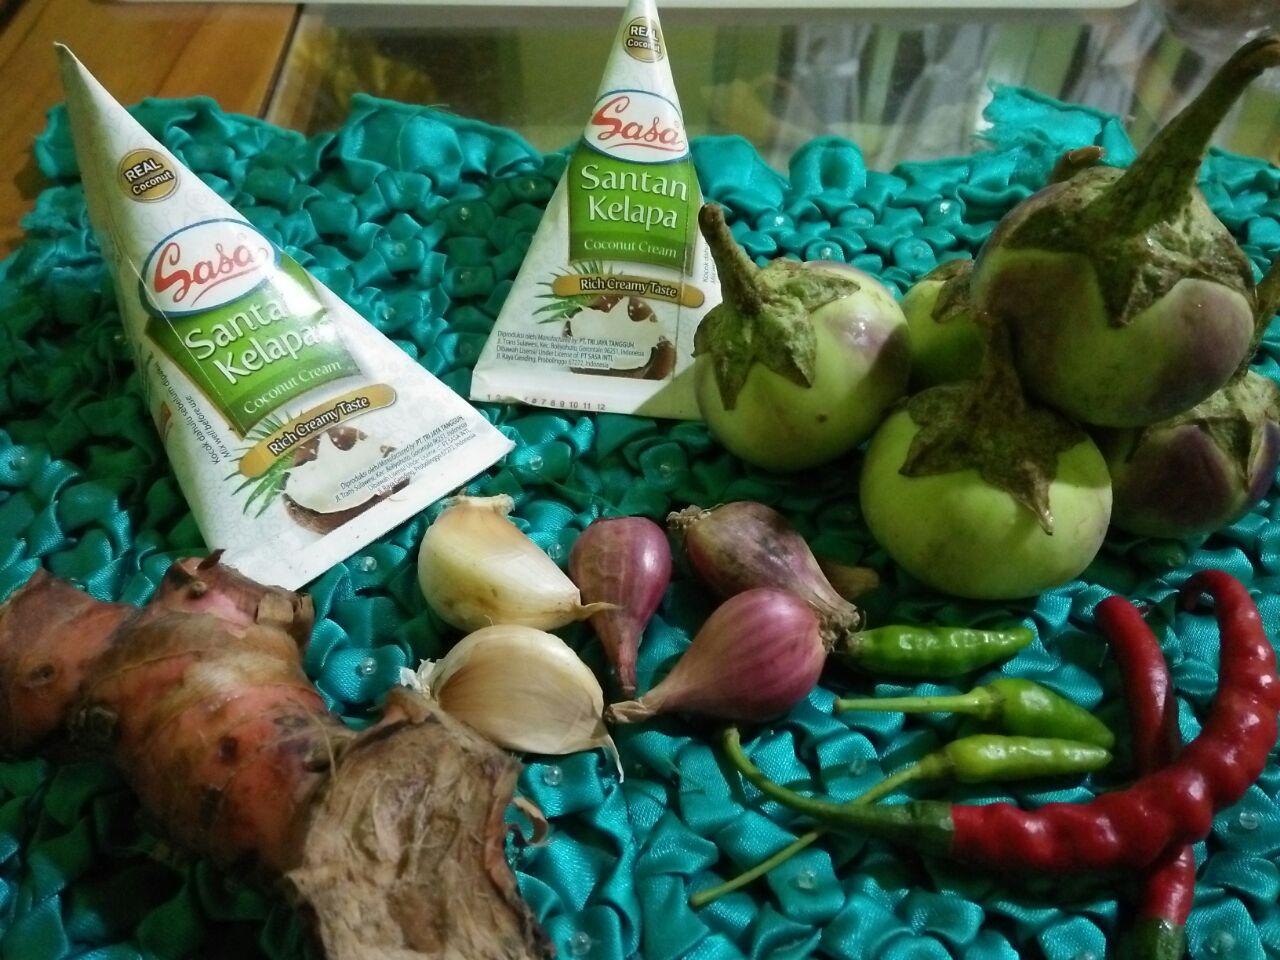 Sasa Santan Kelapa, Inovasi Baru Dalam Dunia Masakan